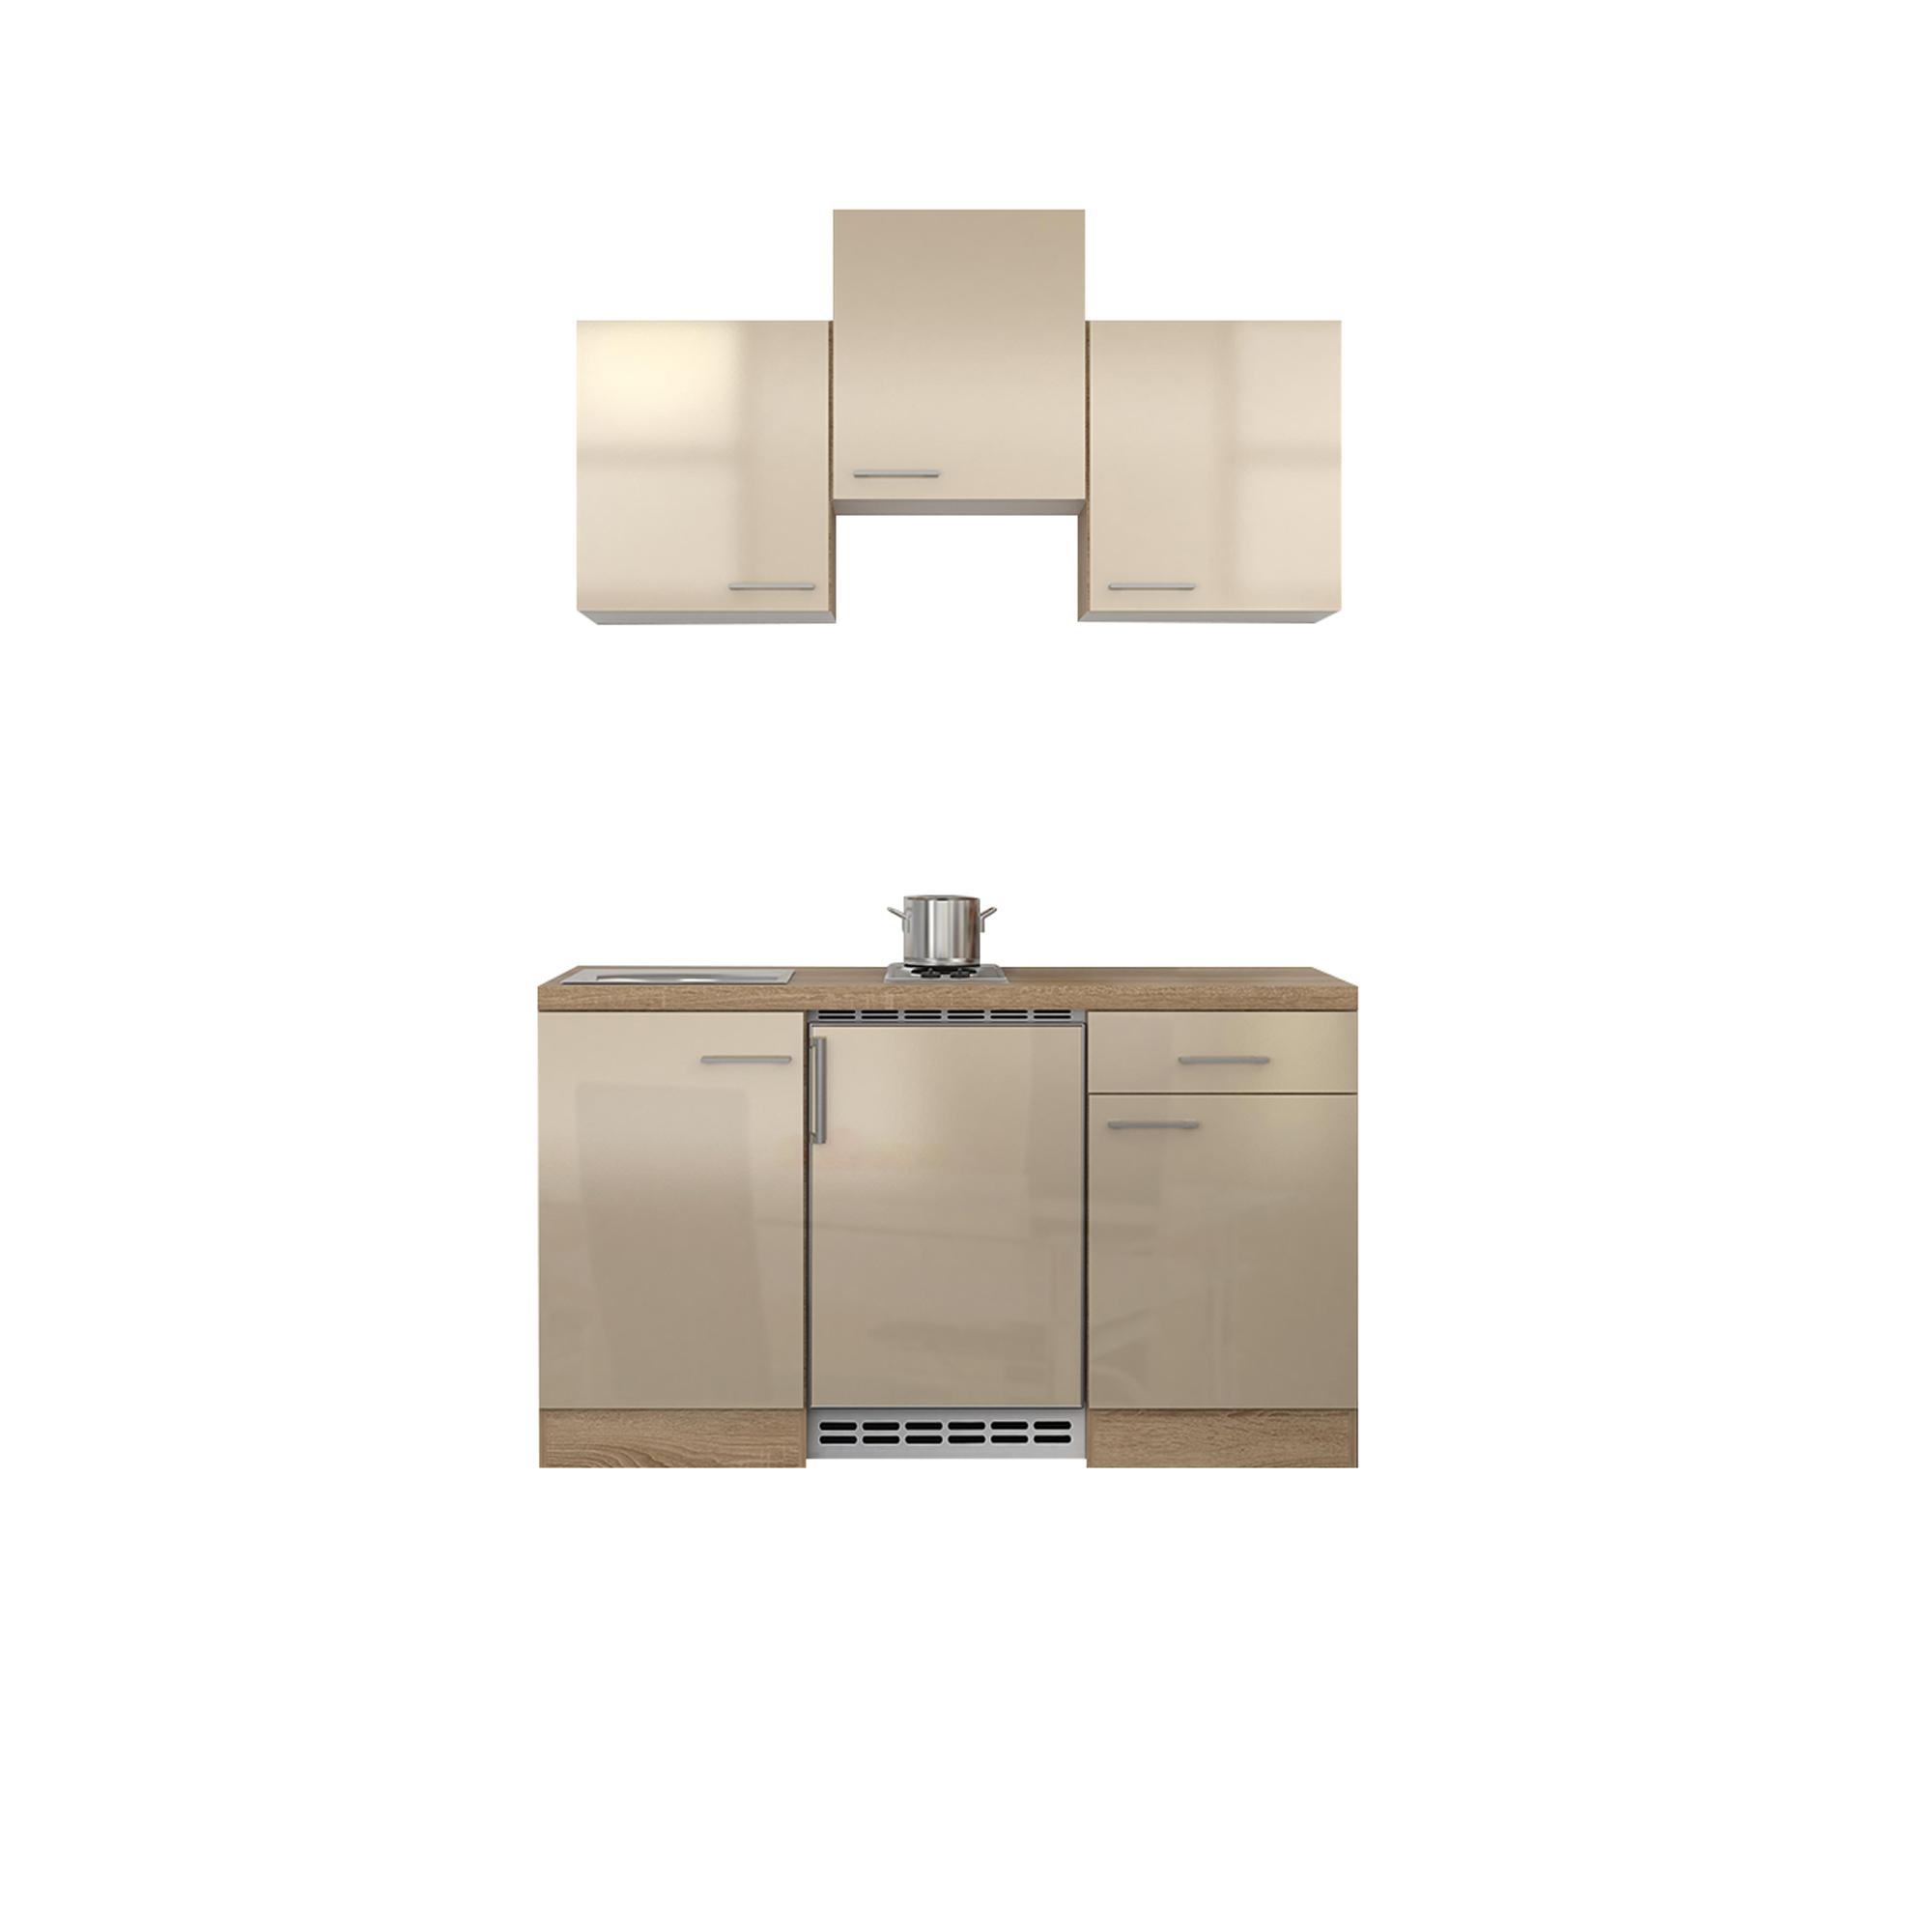 singlek che nepal mit elektrokochfeld und k hlschrank. Black Bedroom Furniture Sets. Home Design Ideas